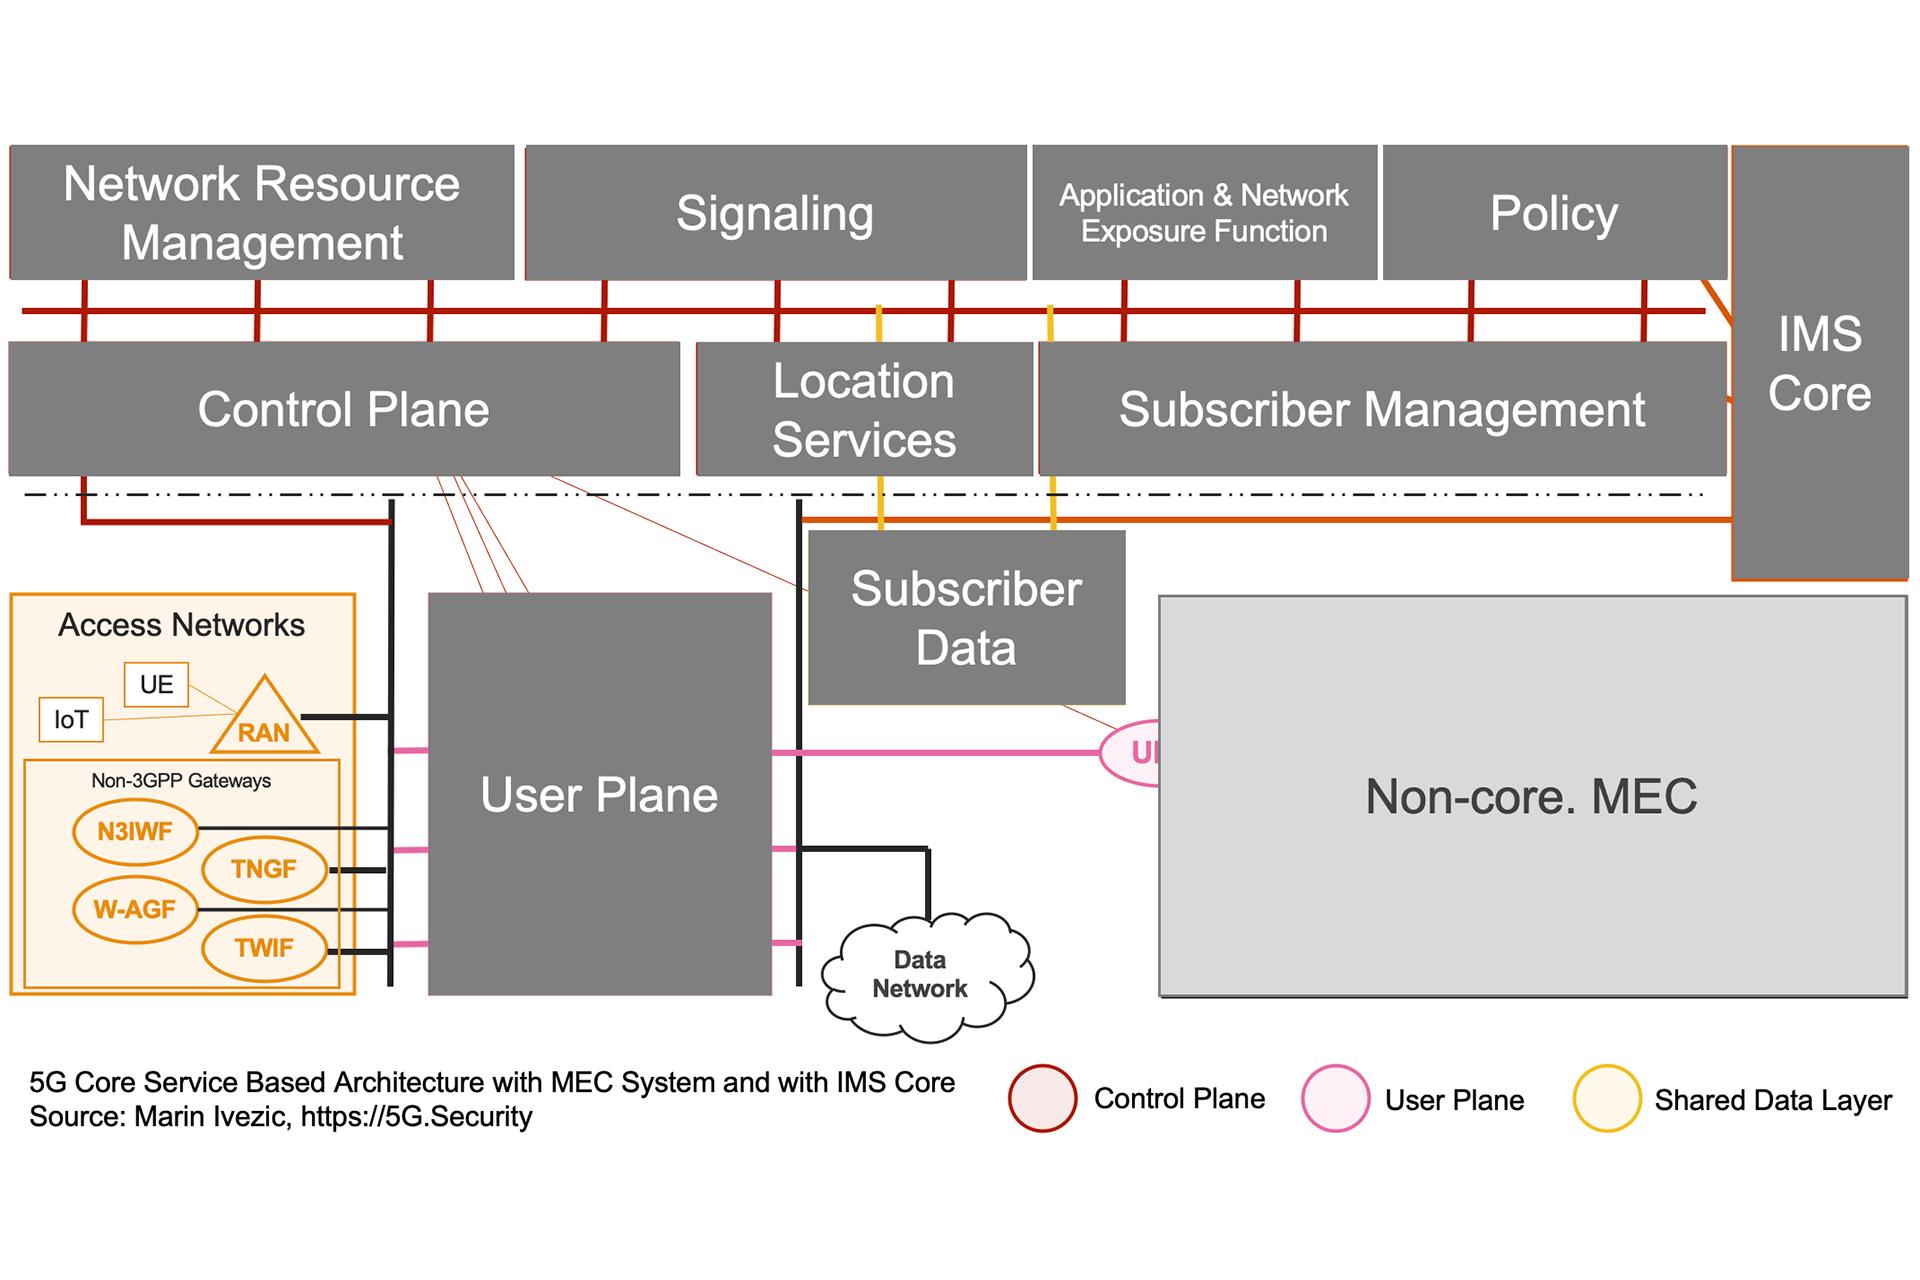 5G SBA IMS MEC Architecture - Access Networks